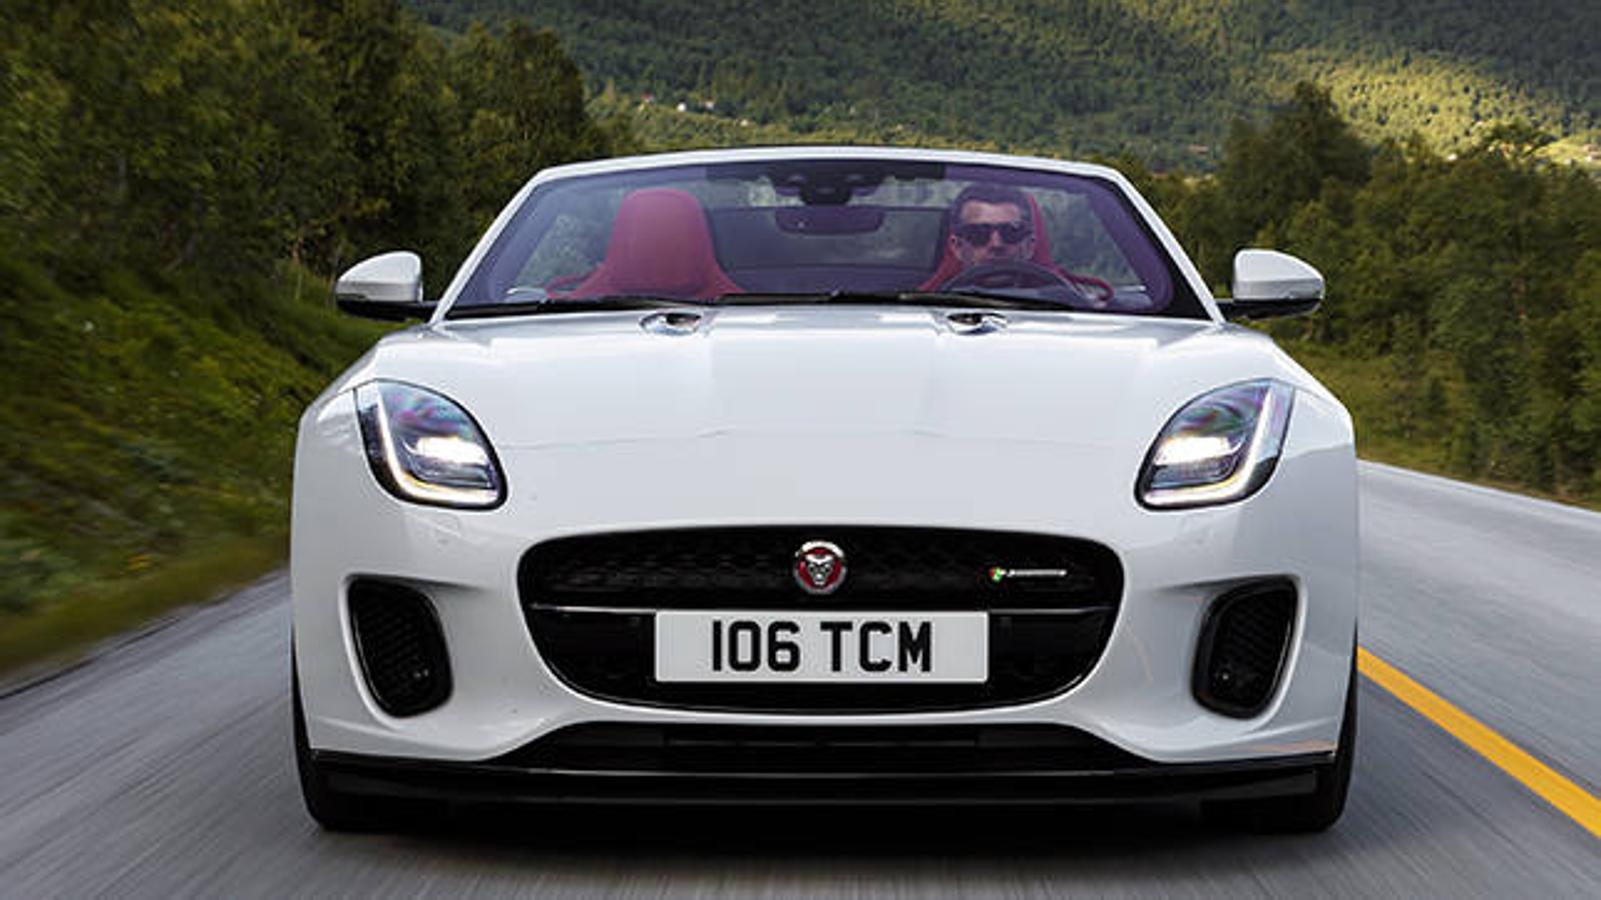 El nuevo Jaguar F-TYPE Convertible de 300 caballos